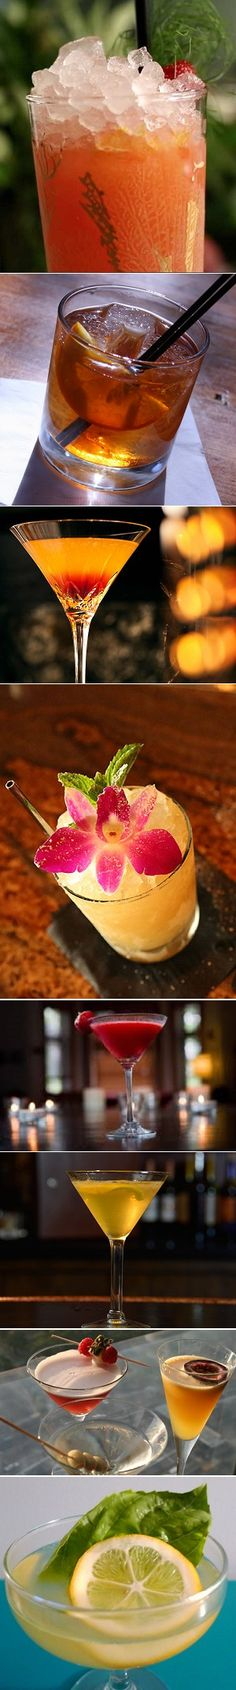 10 Famous Bartender Recipes